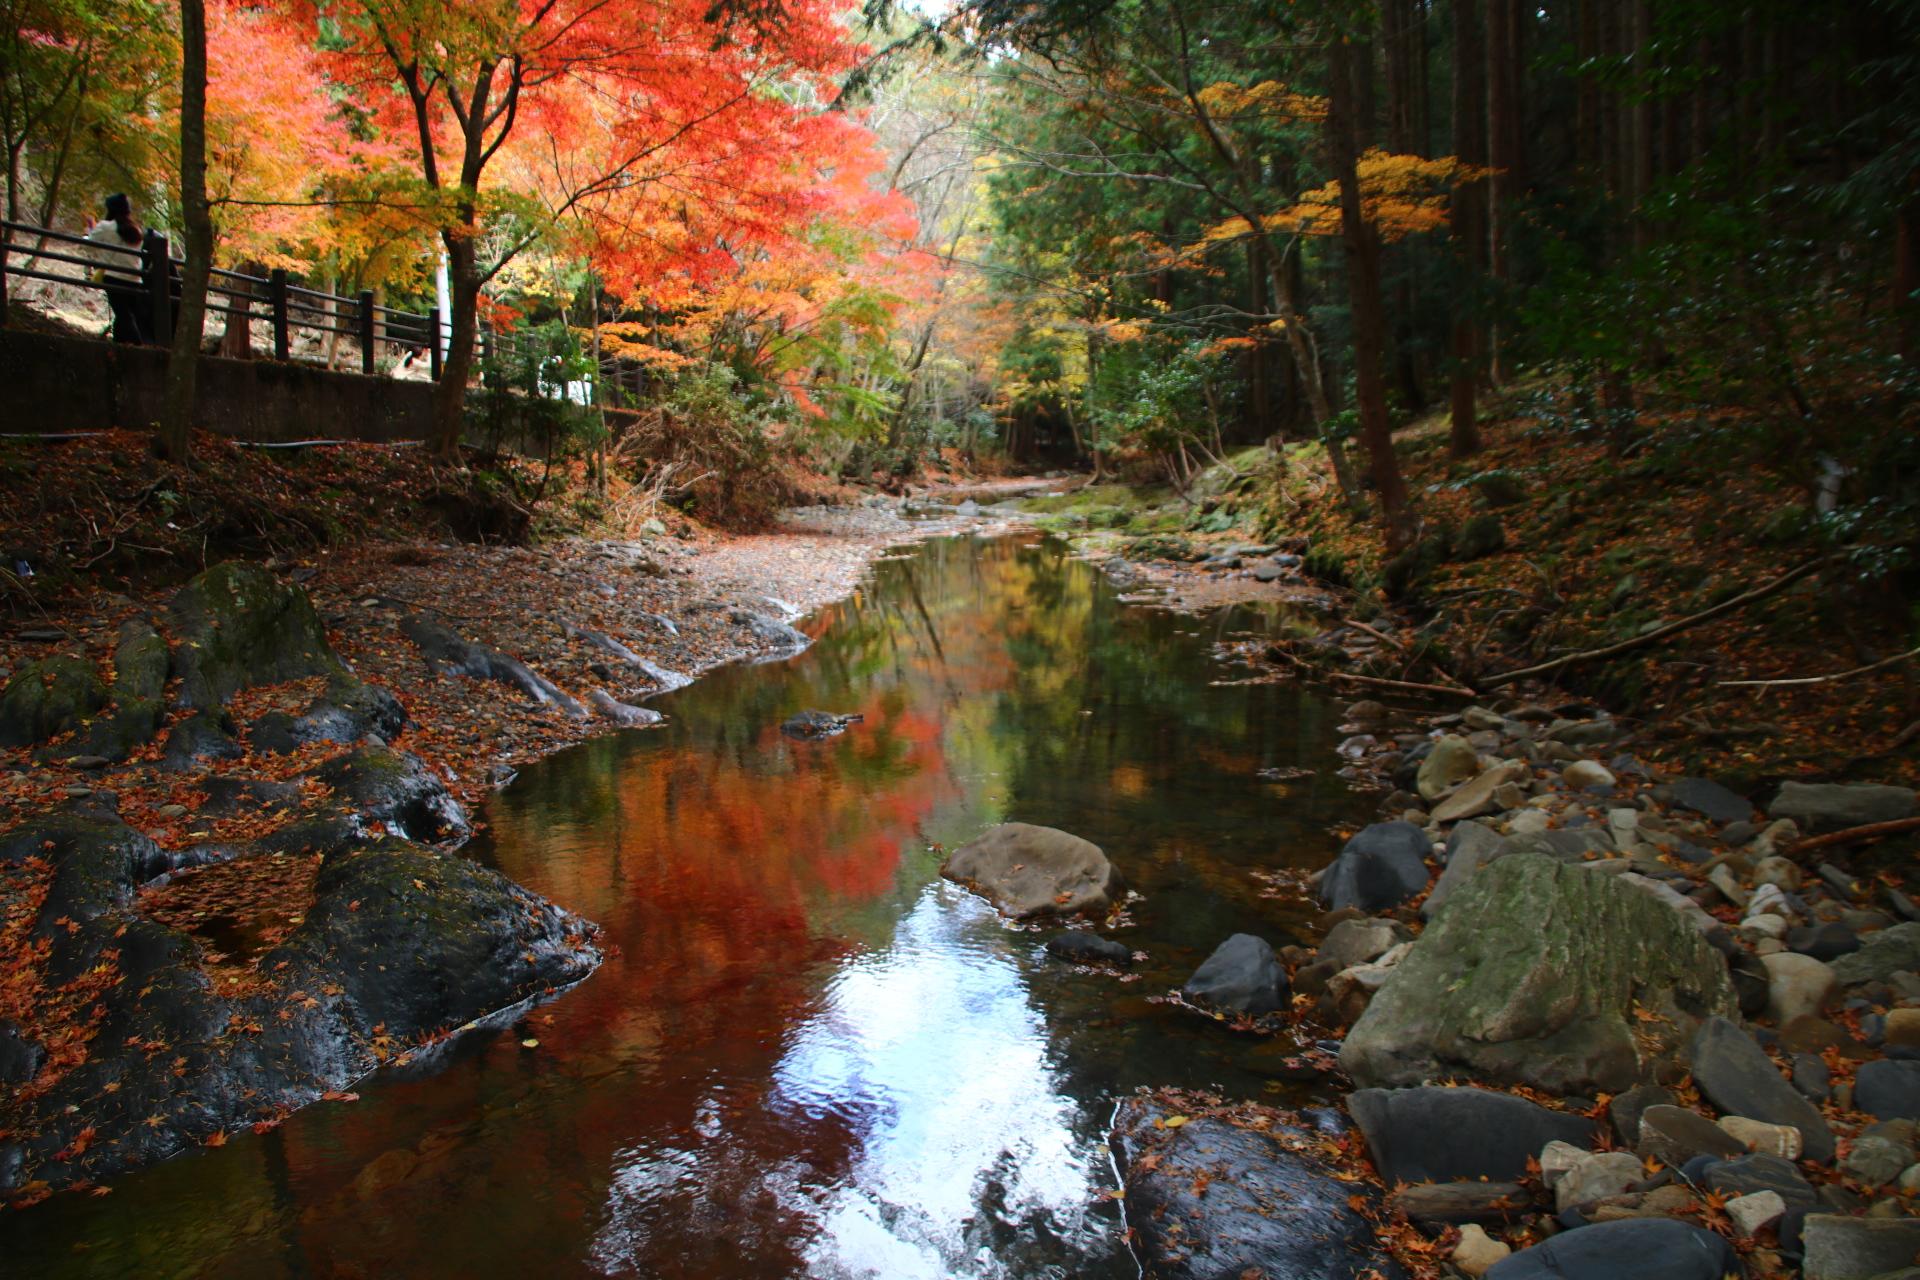 【ORC島鉄フォトコン】秋を映して @tahkinoyaさん